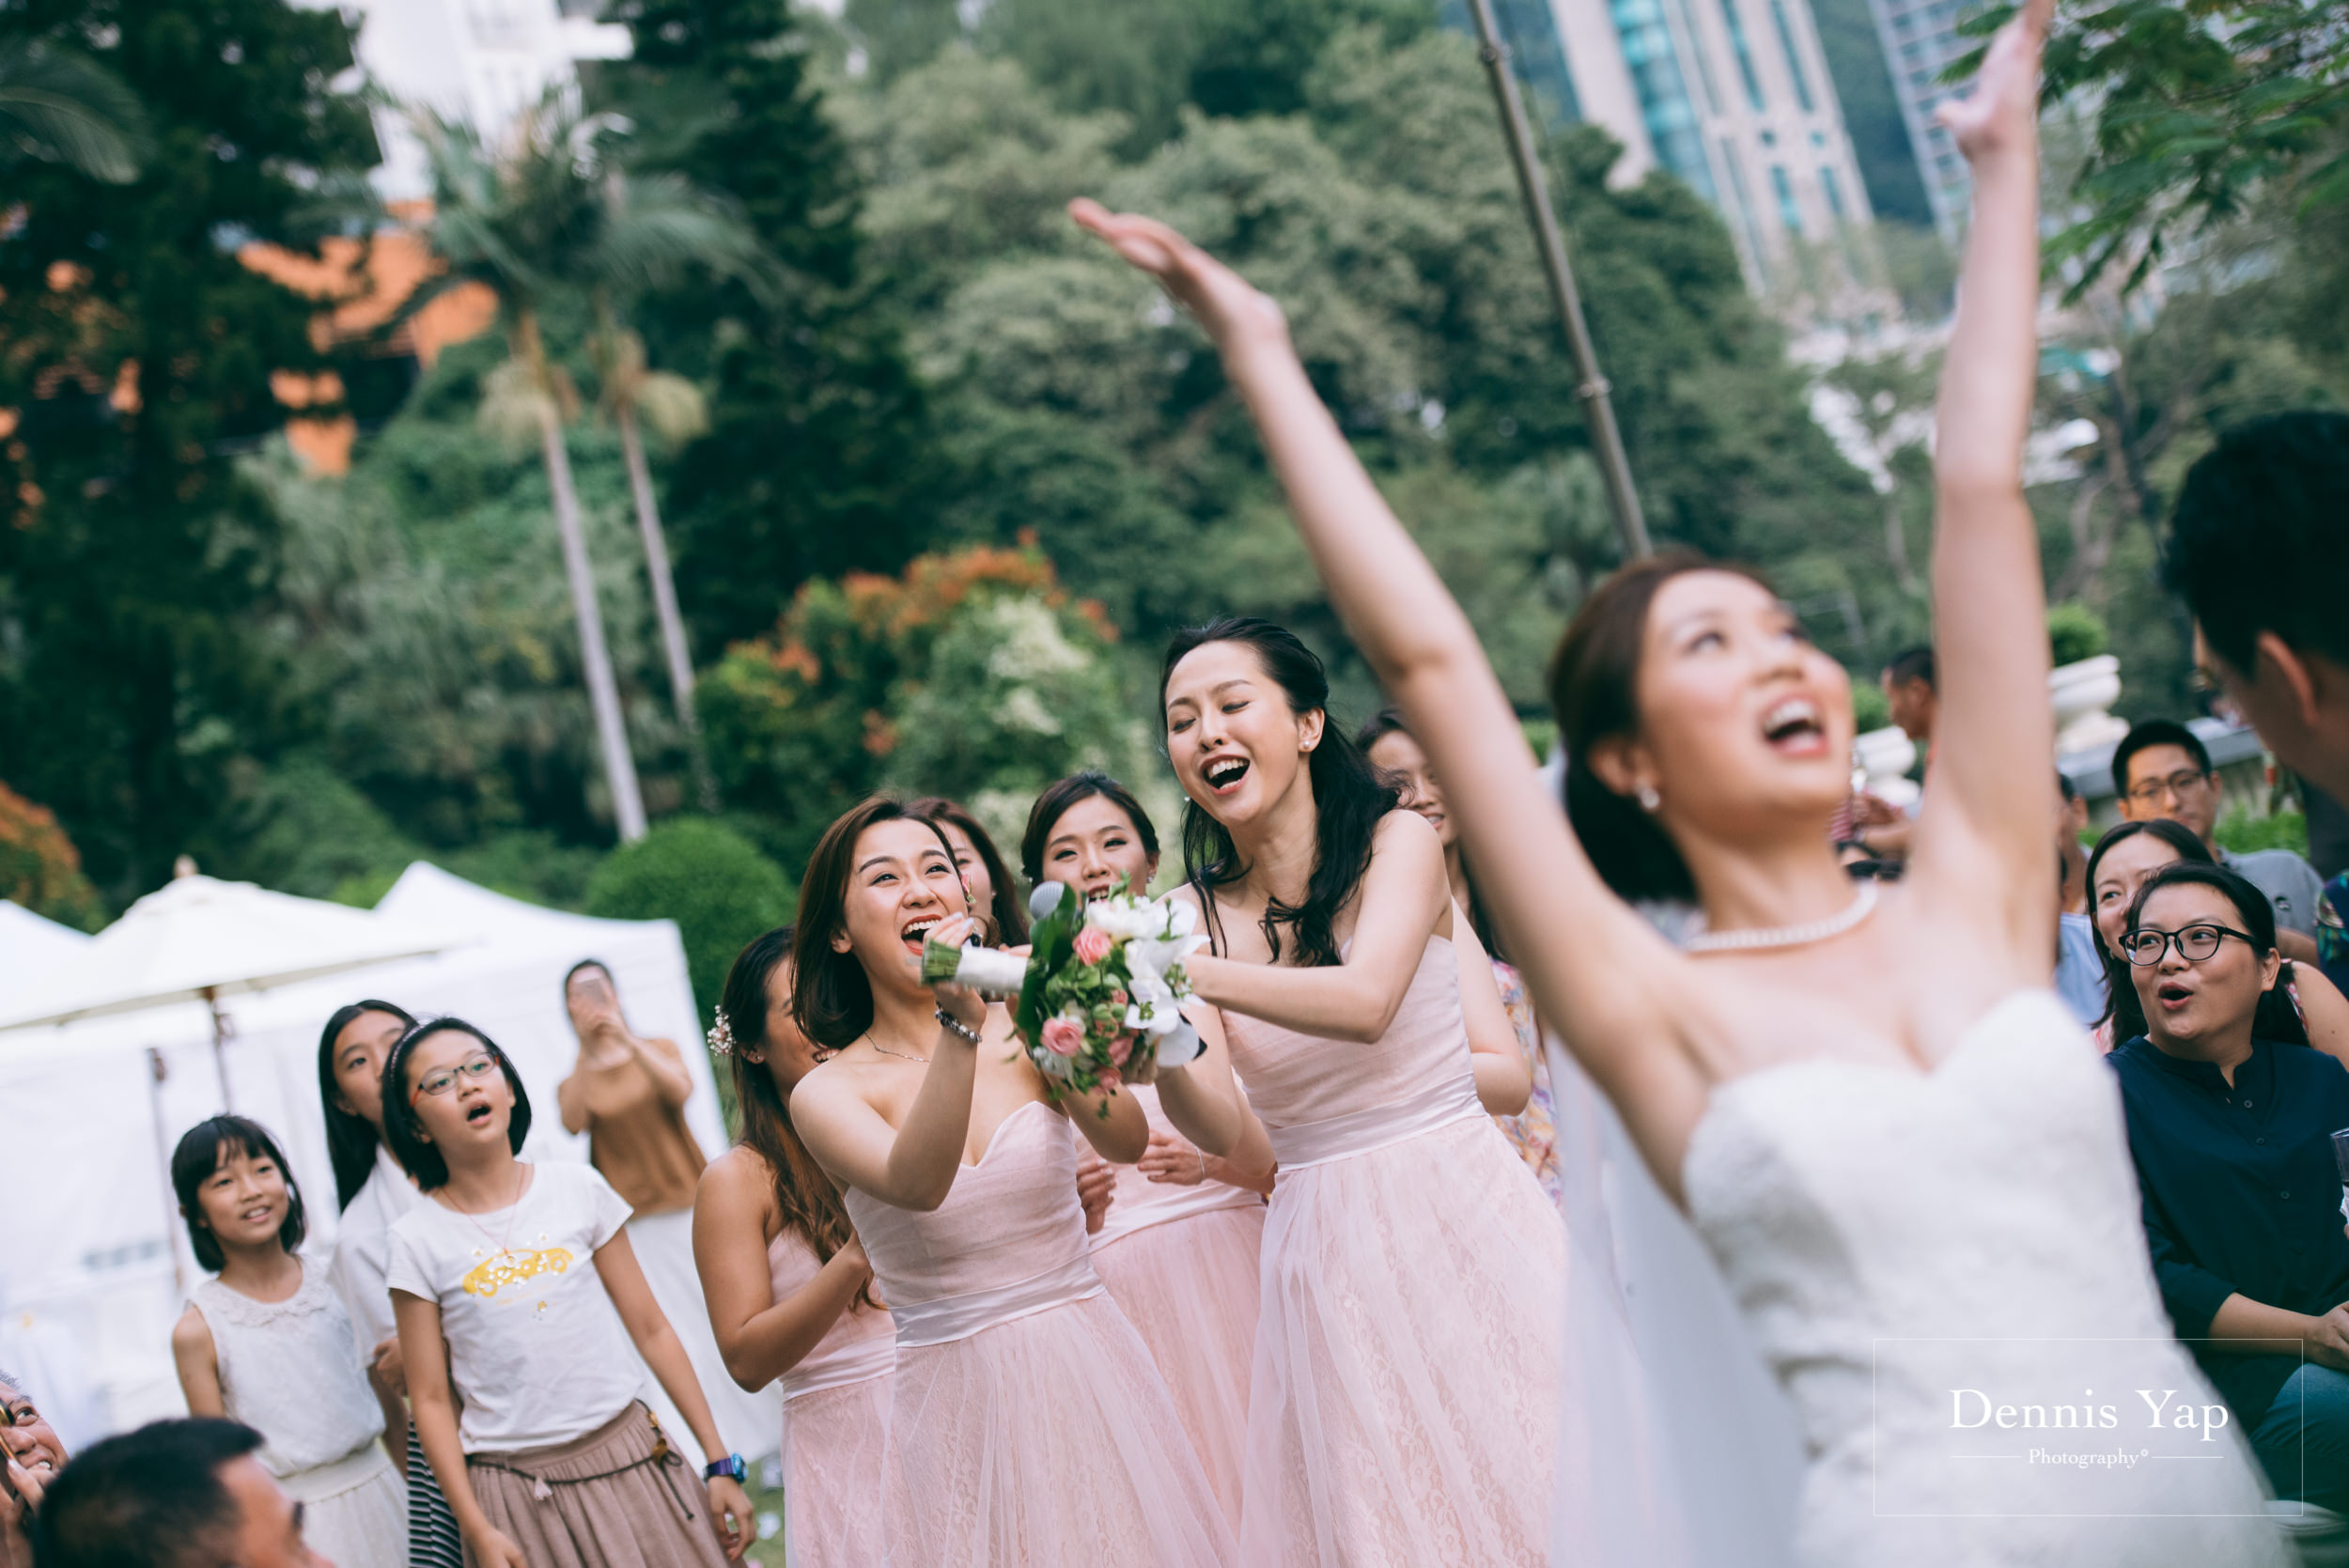 jason crystal wedding day gate crash hong kong garden wedding dennis yap photography-34.jpg